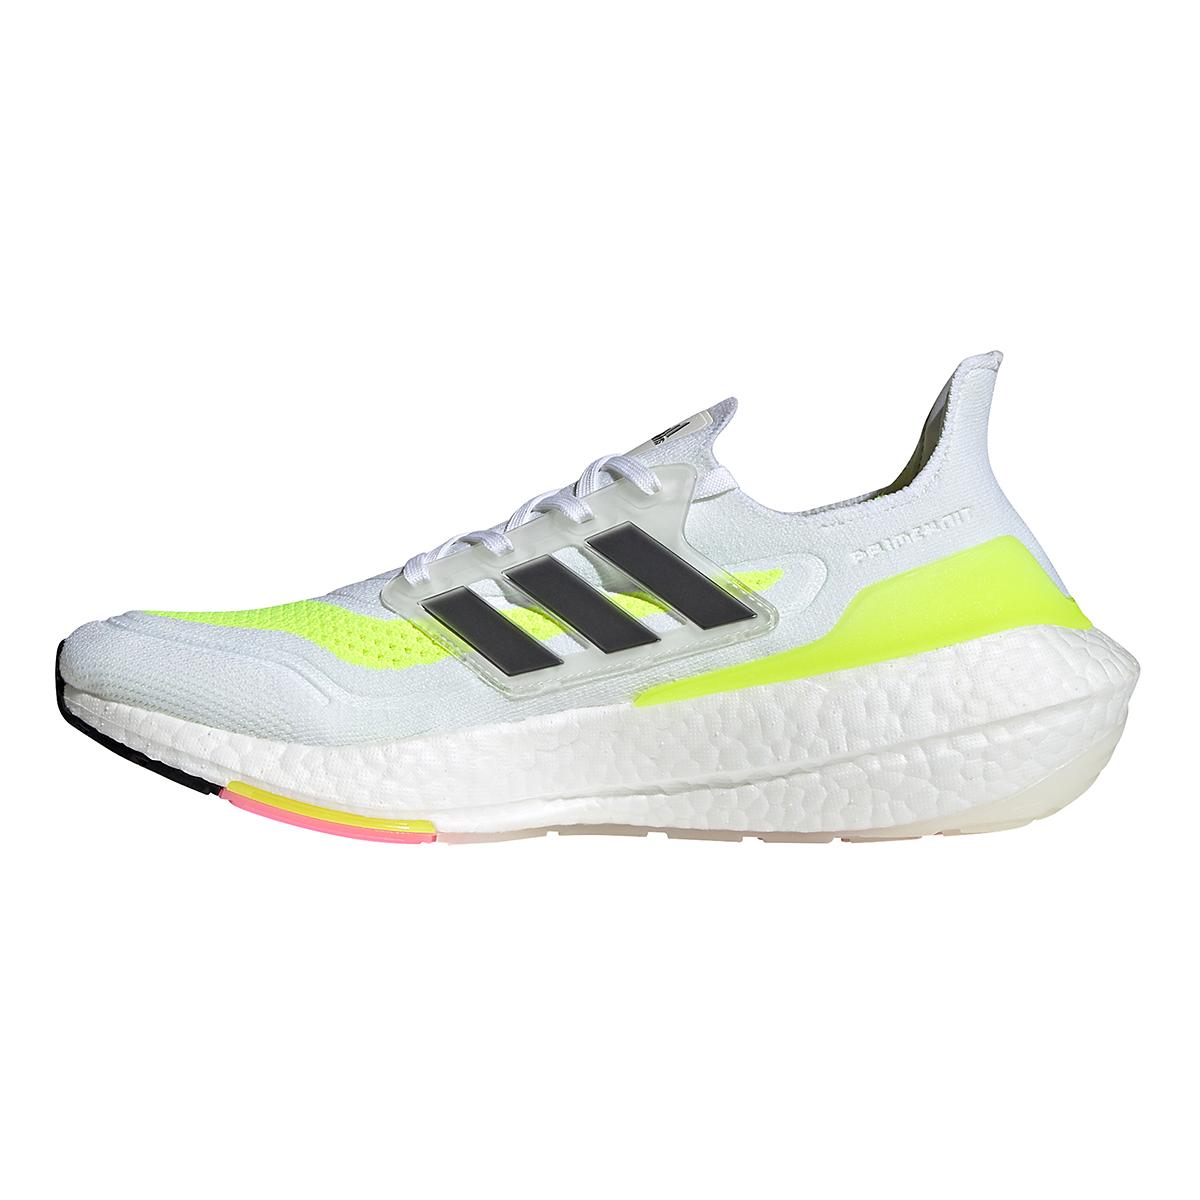 Men's Adidas Ultraboost 21 Running Shoe - Color: Cloud White/Black/Solar Yellow - Size: 5 - Width: Regular, Cloud White/Black/Solar Yellow, large, image 3